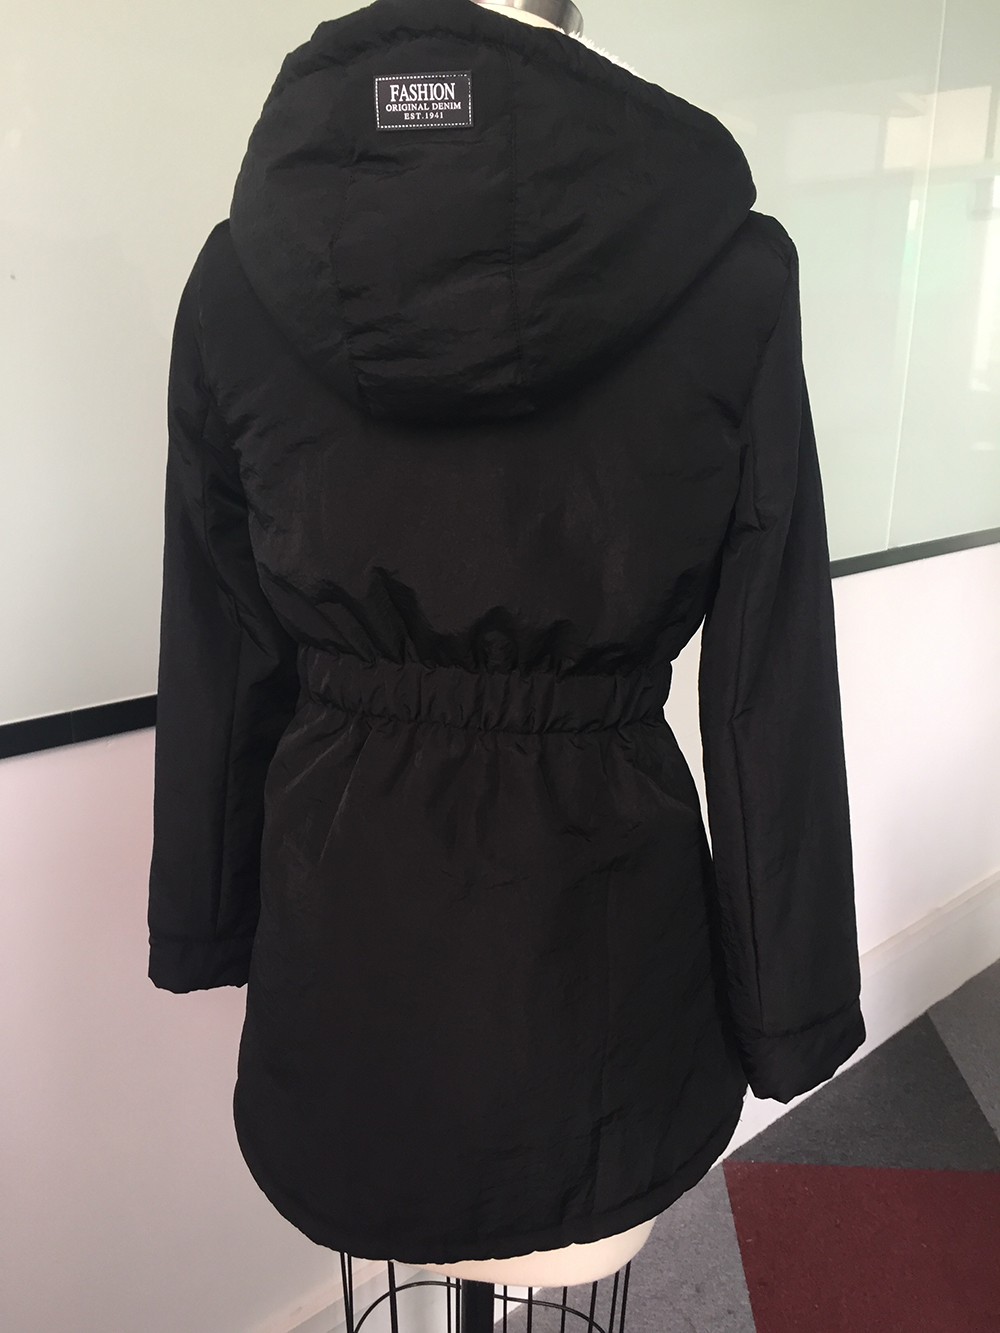 Winter Warm Coat Female Windproof Slim Outerwear Fashion Elastic Waist Zipper Pocket Hooded Drawstring Overcoats Autumn Clothes 3